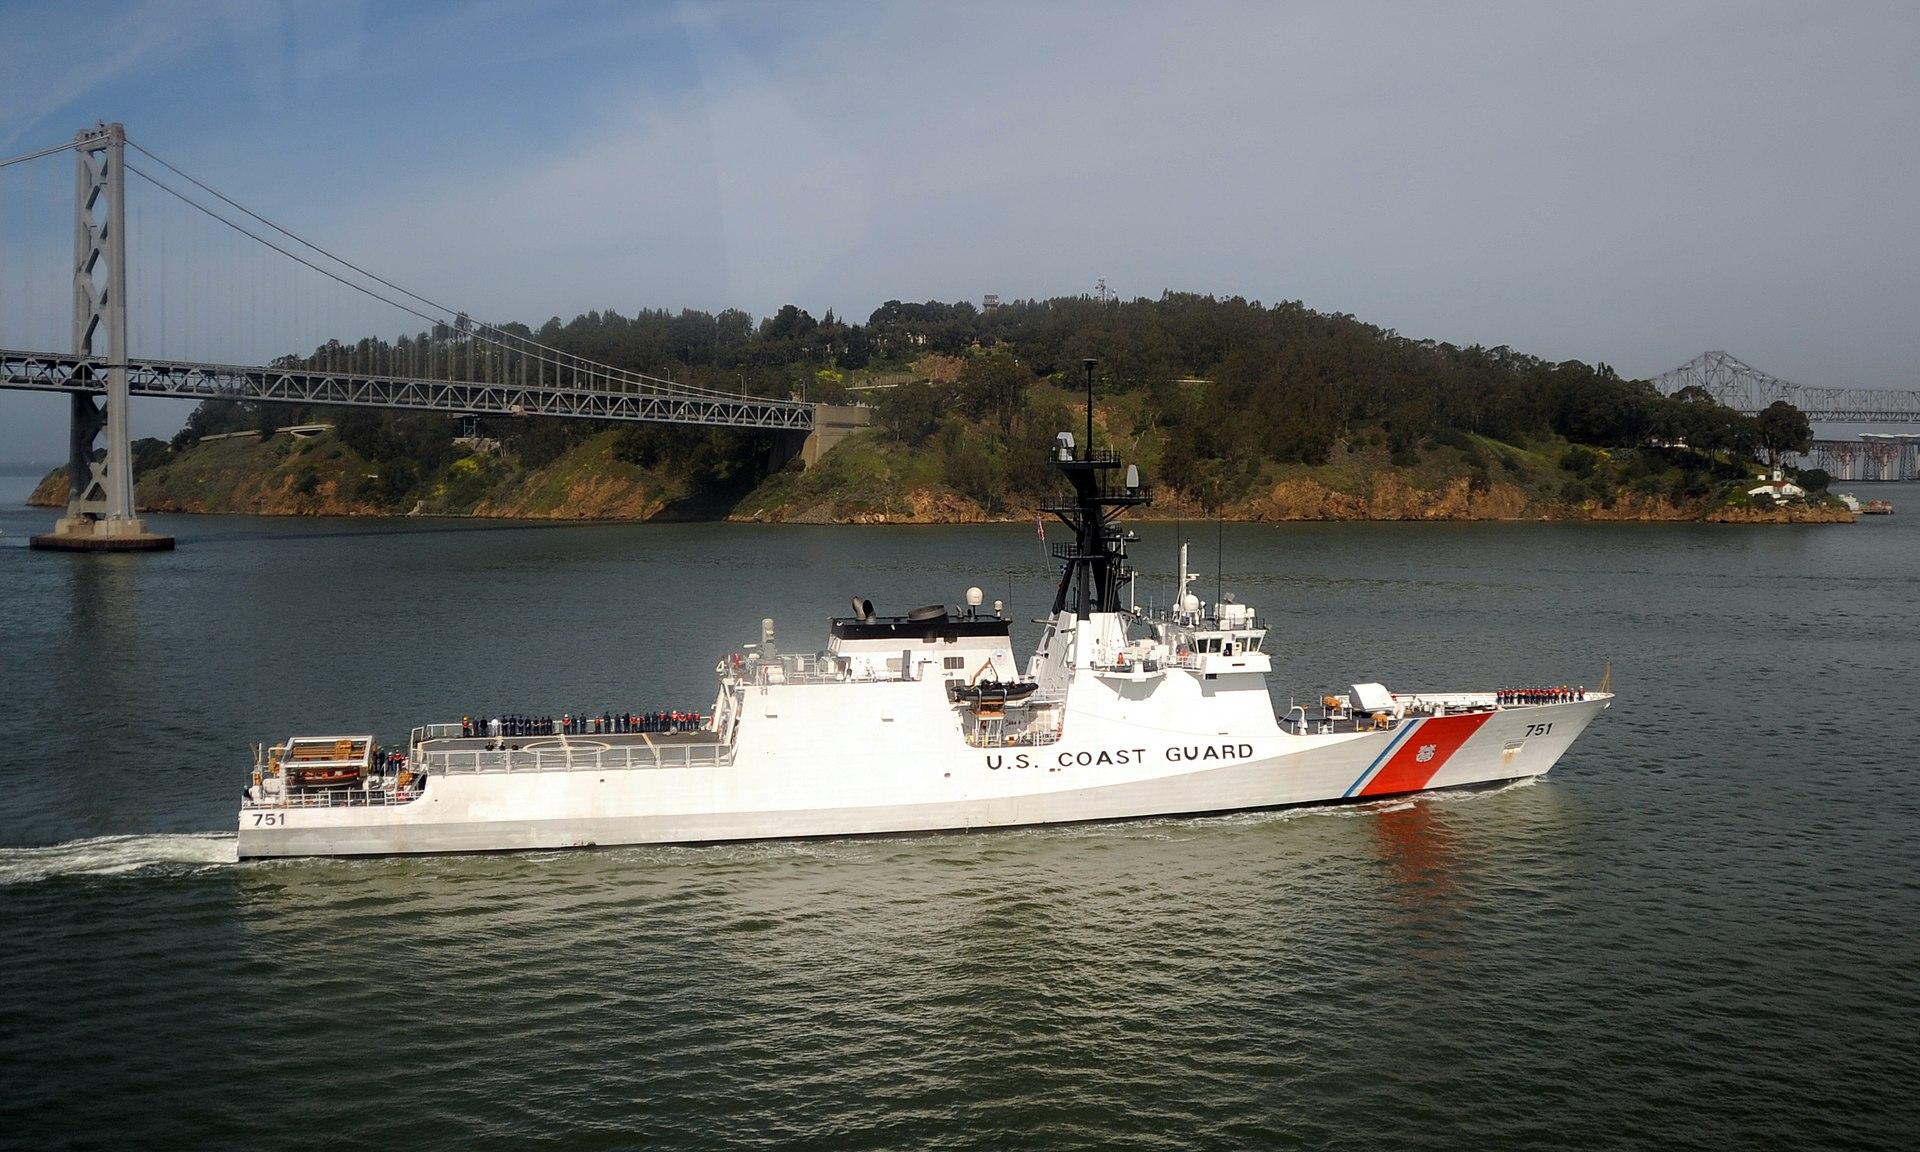 USCGC_Waesche_by_Yerba_Buena_Island.jpg